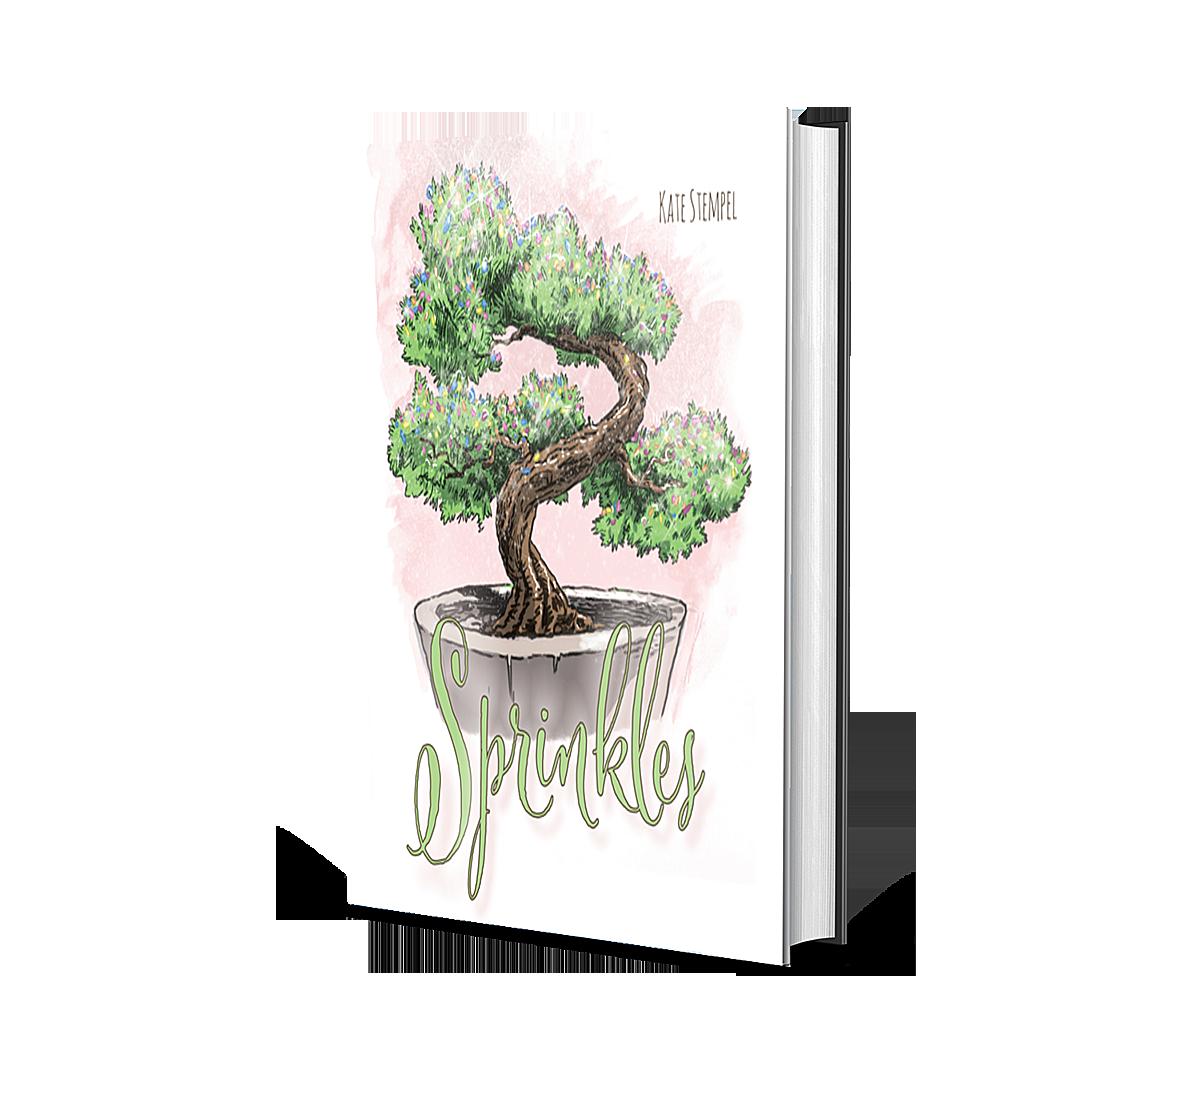 Kate Stempel Sprinkles book cover image